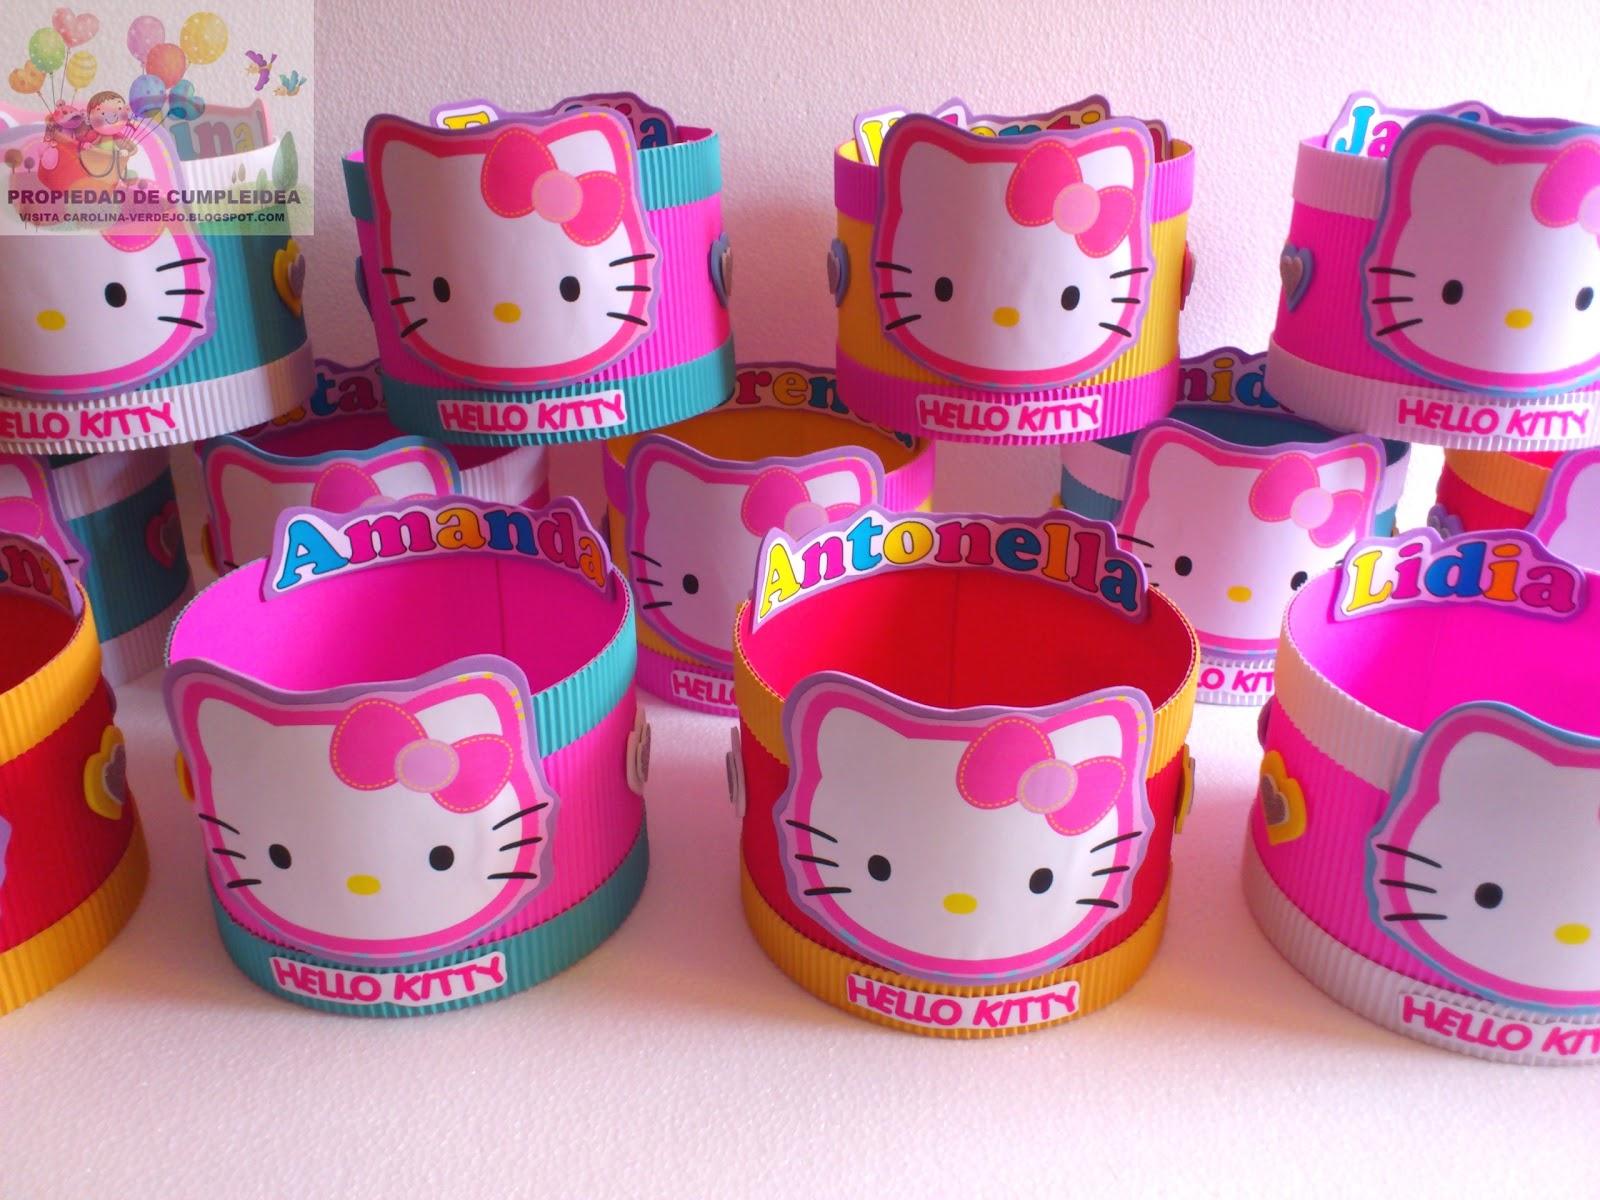 Decoracion Hello Kitty Para Cumplea?os ~ Related to Decoraci?n de u?as Hello Kitty  Hello Kitty nail art